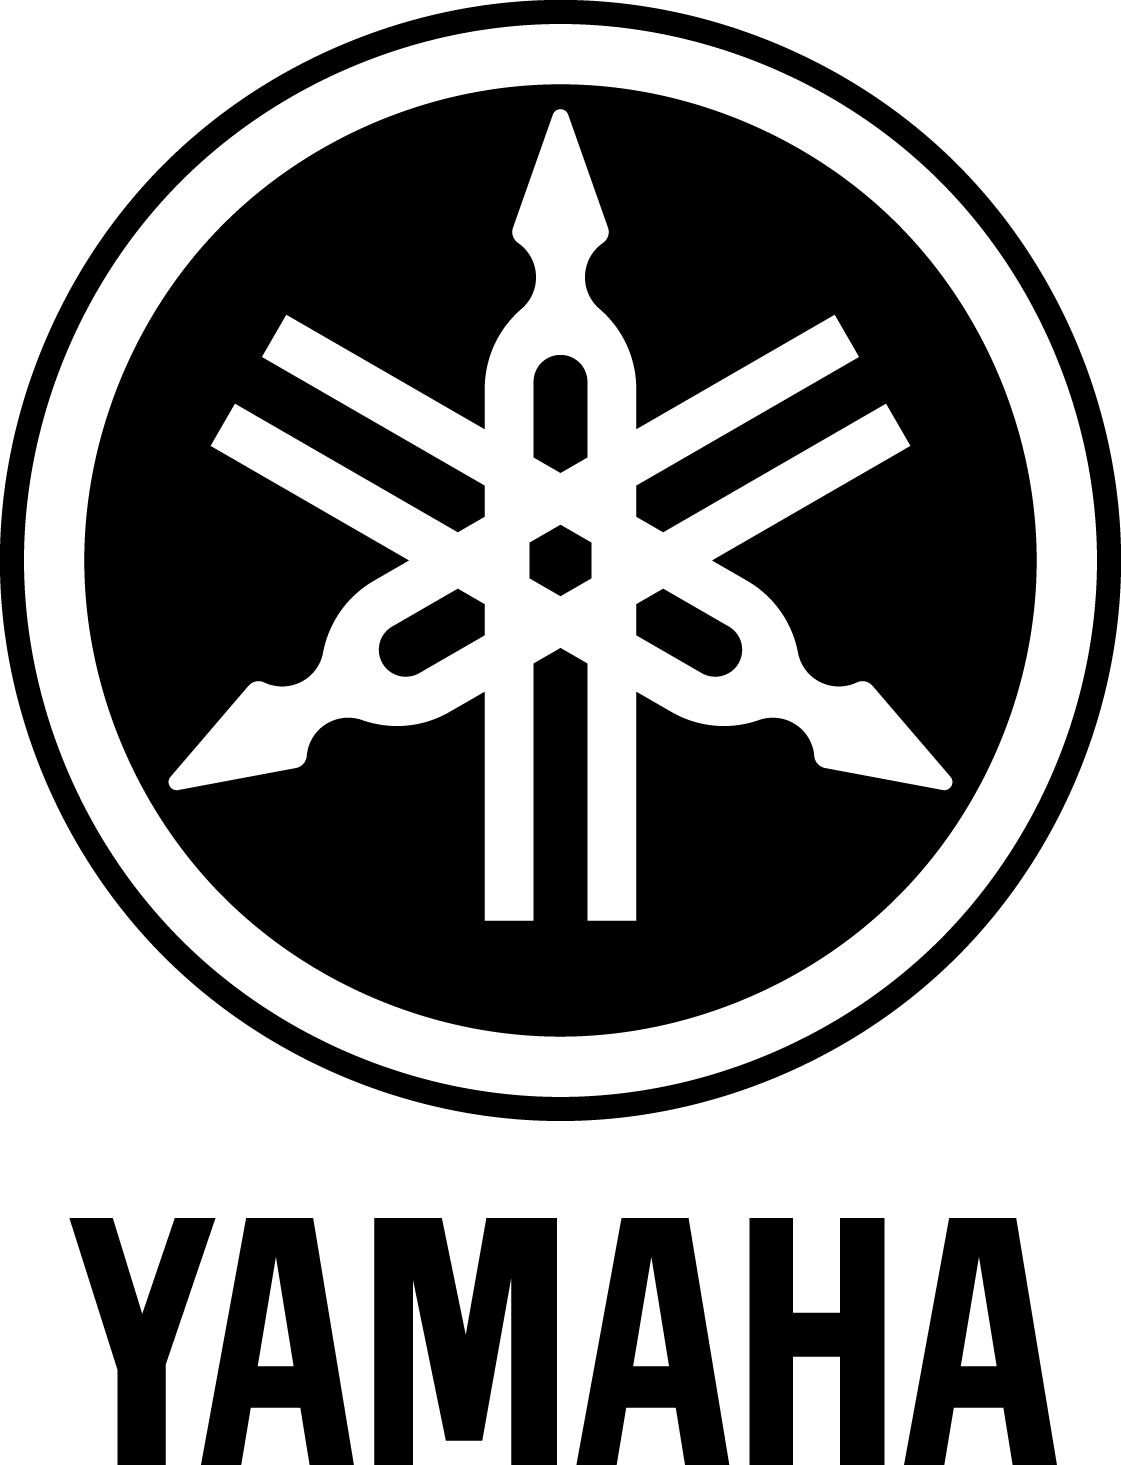 small resolution of yamaha logo